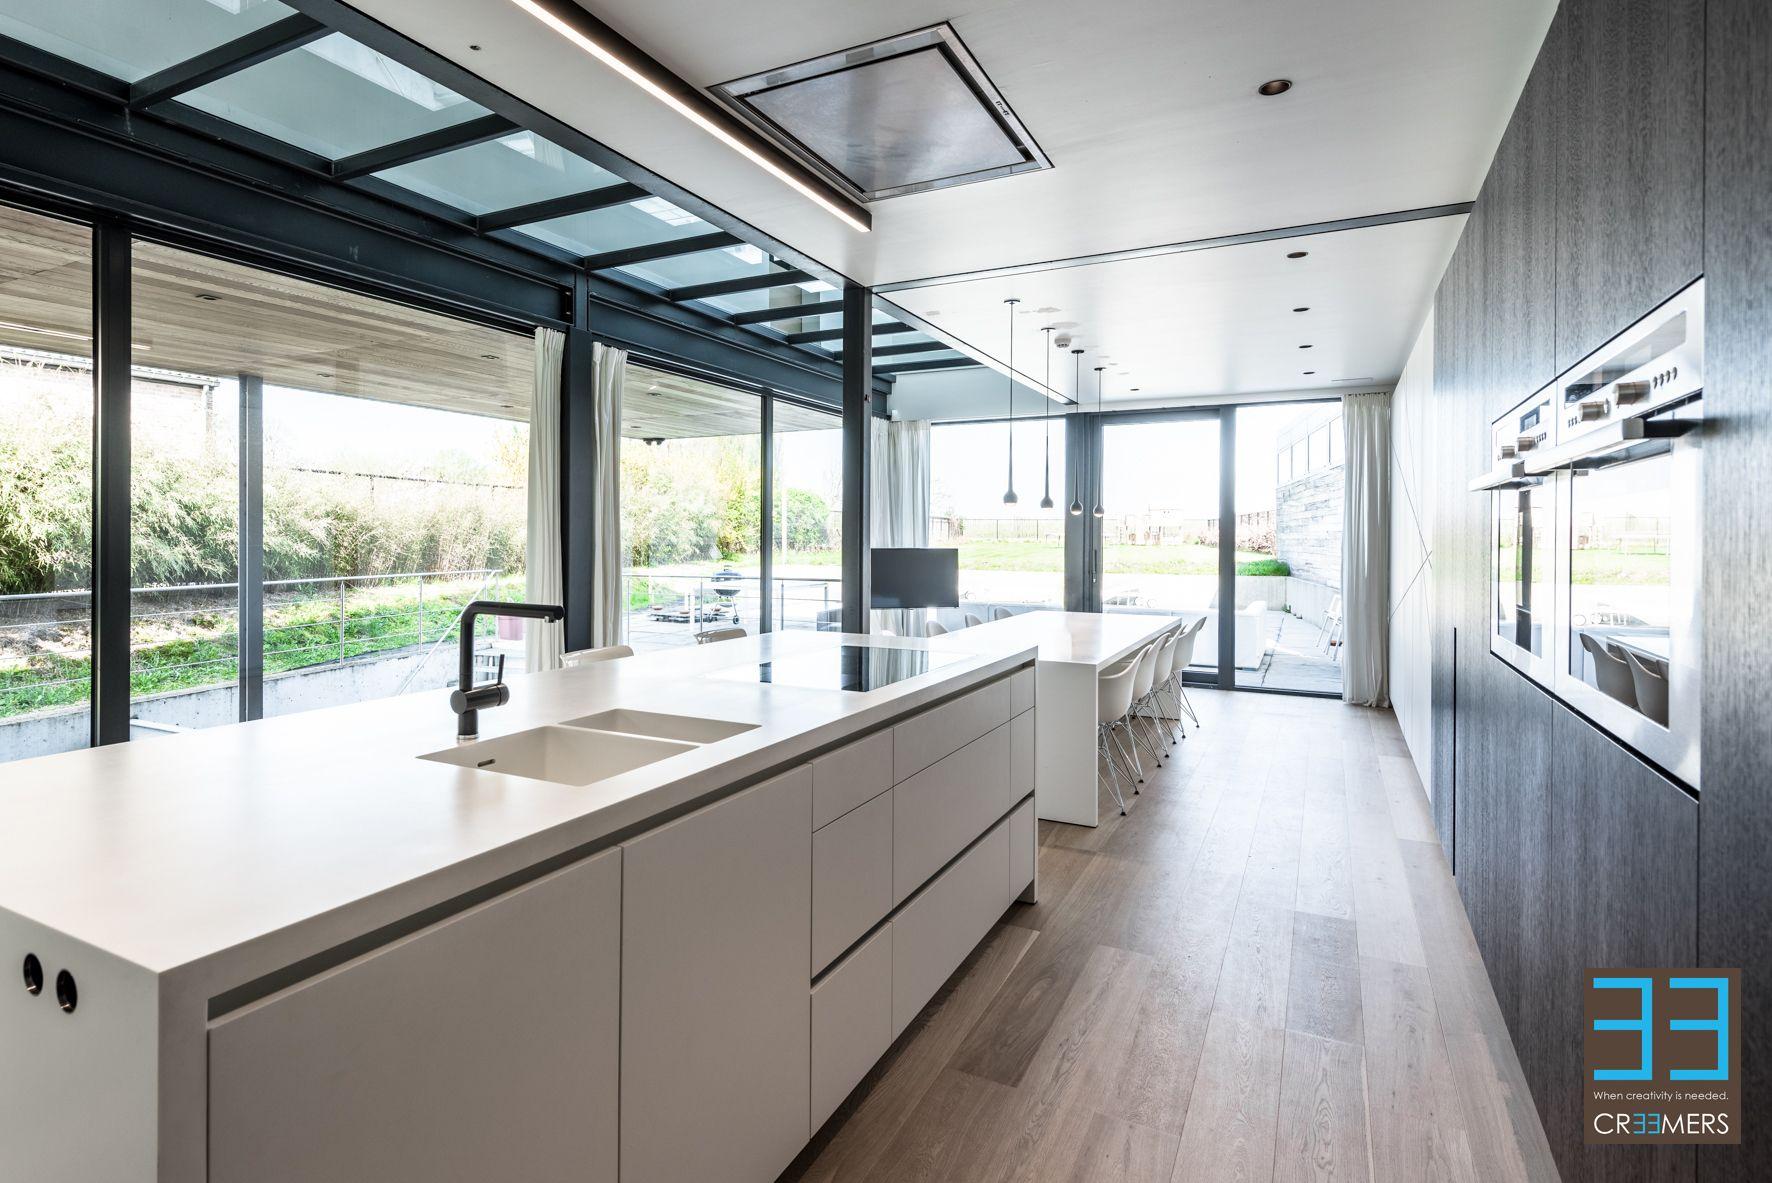 Keuken ontwerp in zwart wit in moderne stijl keukentablet in